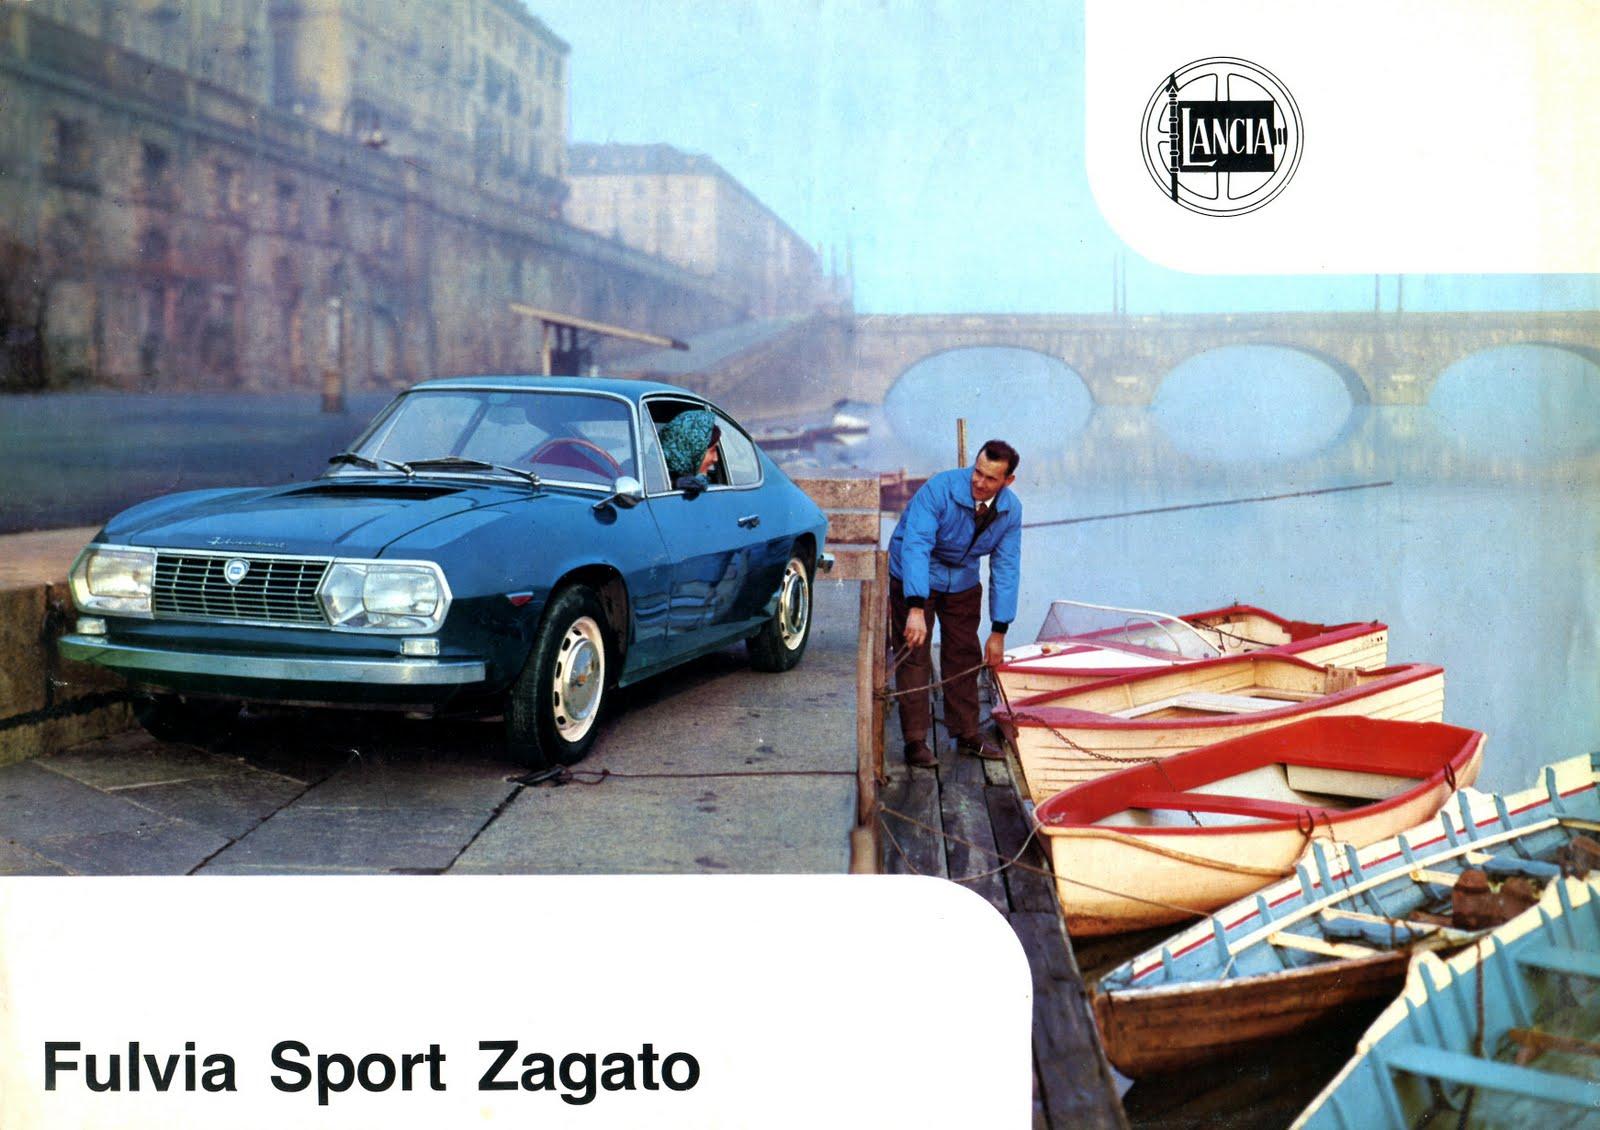 For my Fulvia Sport Zagato I